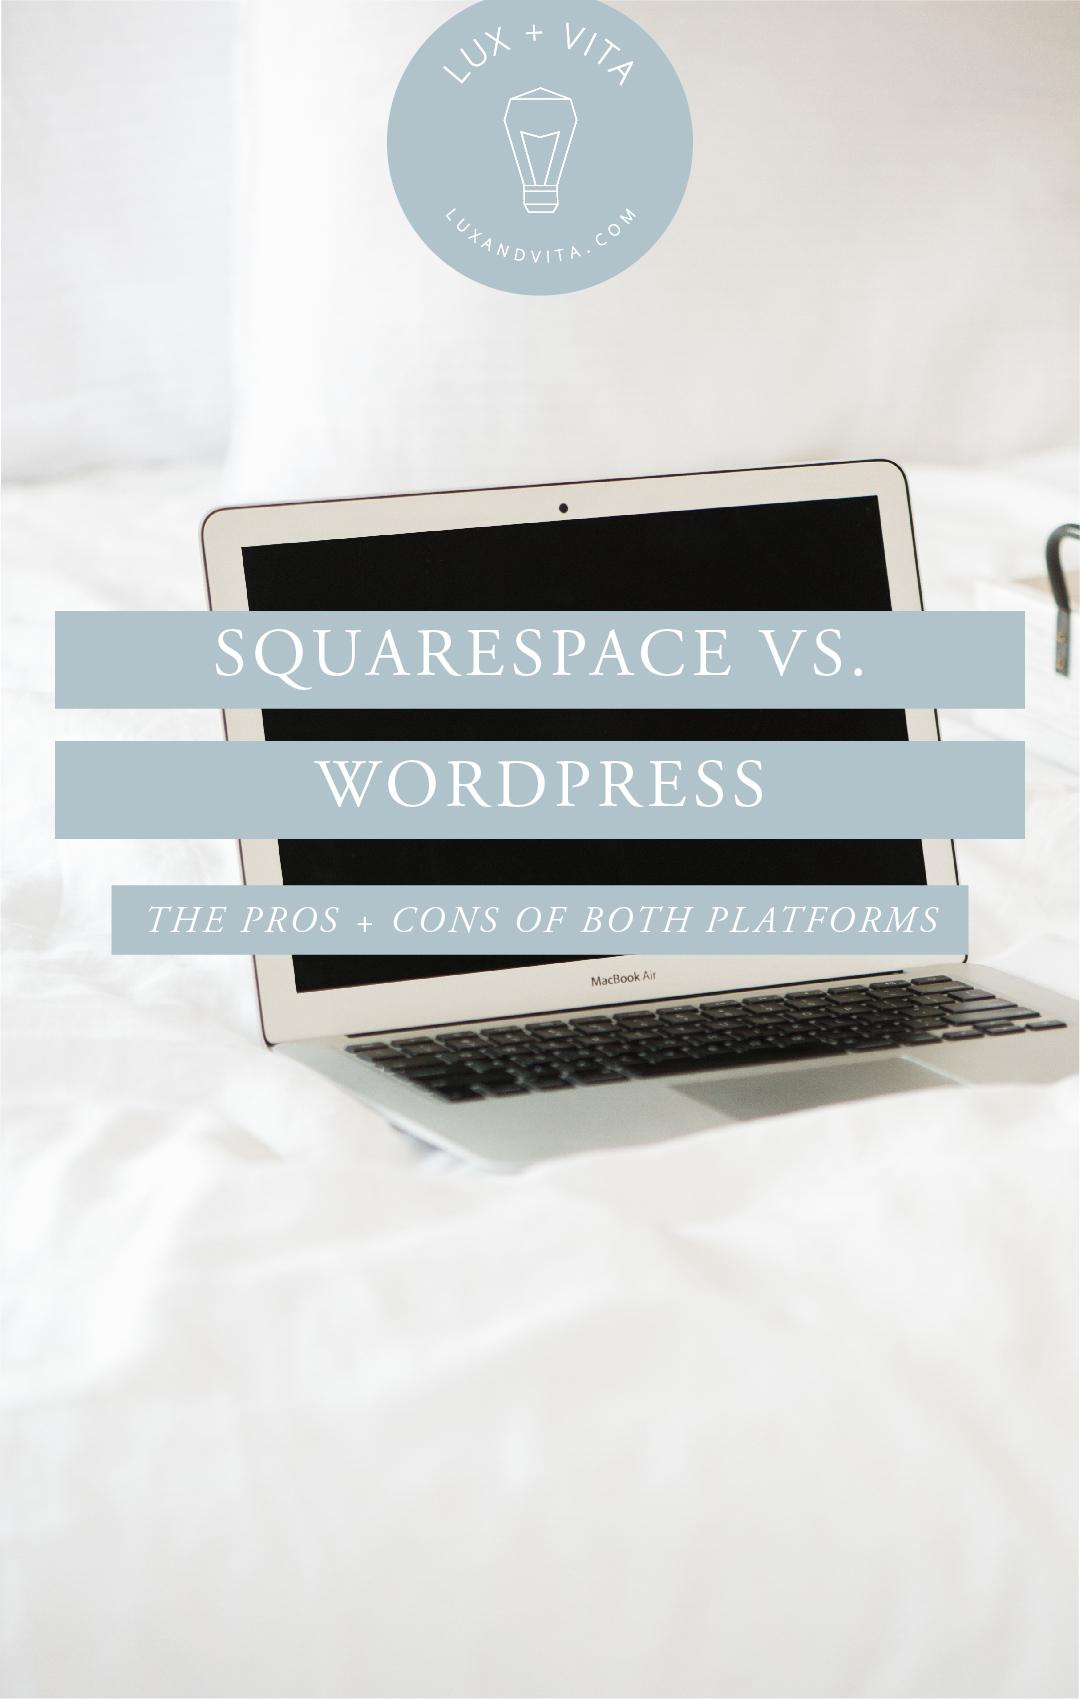 Squarespace vs Wordpress #prosofsquarespace #consofsquarespace #prosofwordpress #consofwordpress